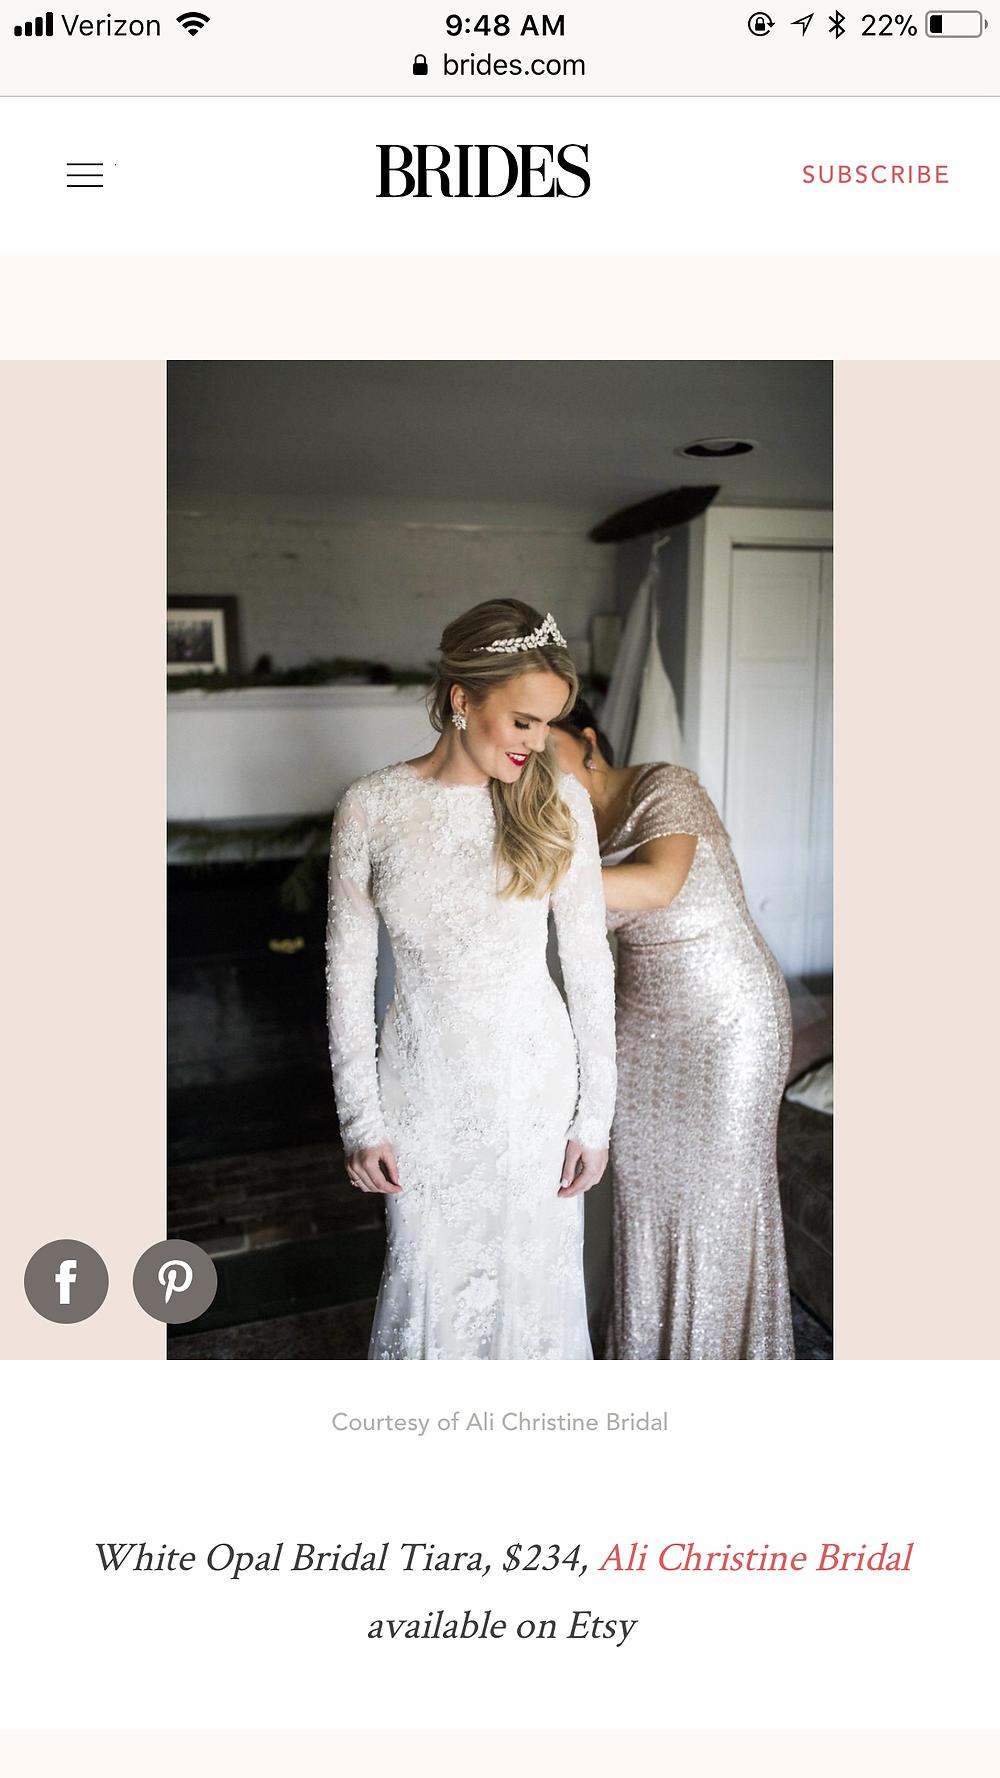 BRIDES.com Feature with ISLA Bridal Tiara by Ali Christine Bridal